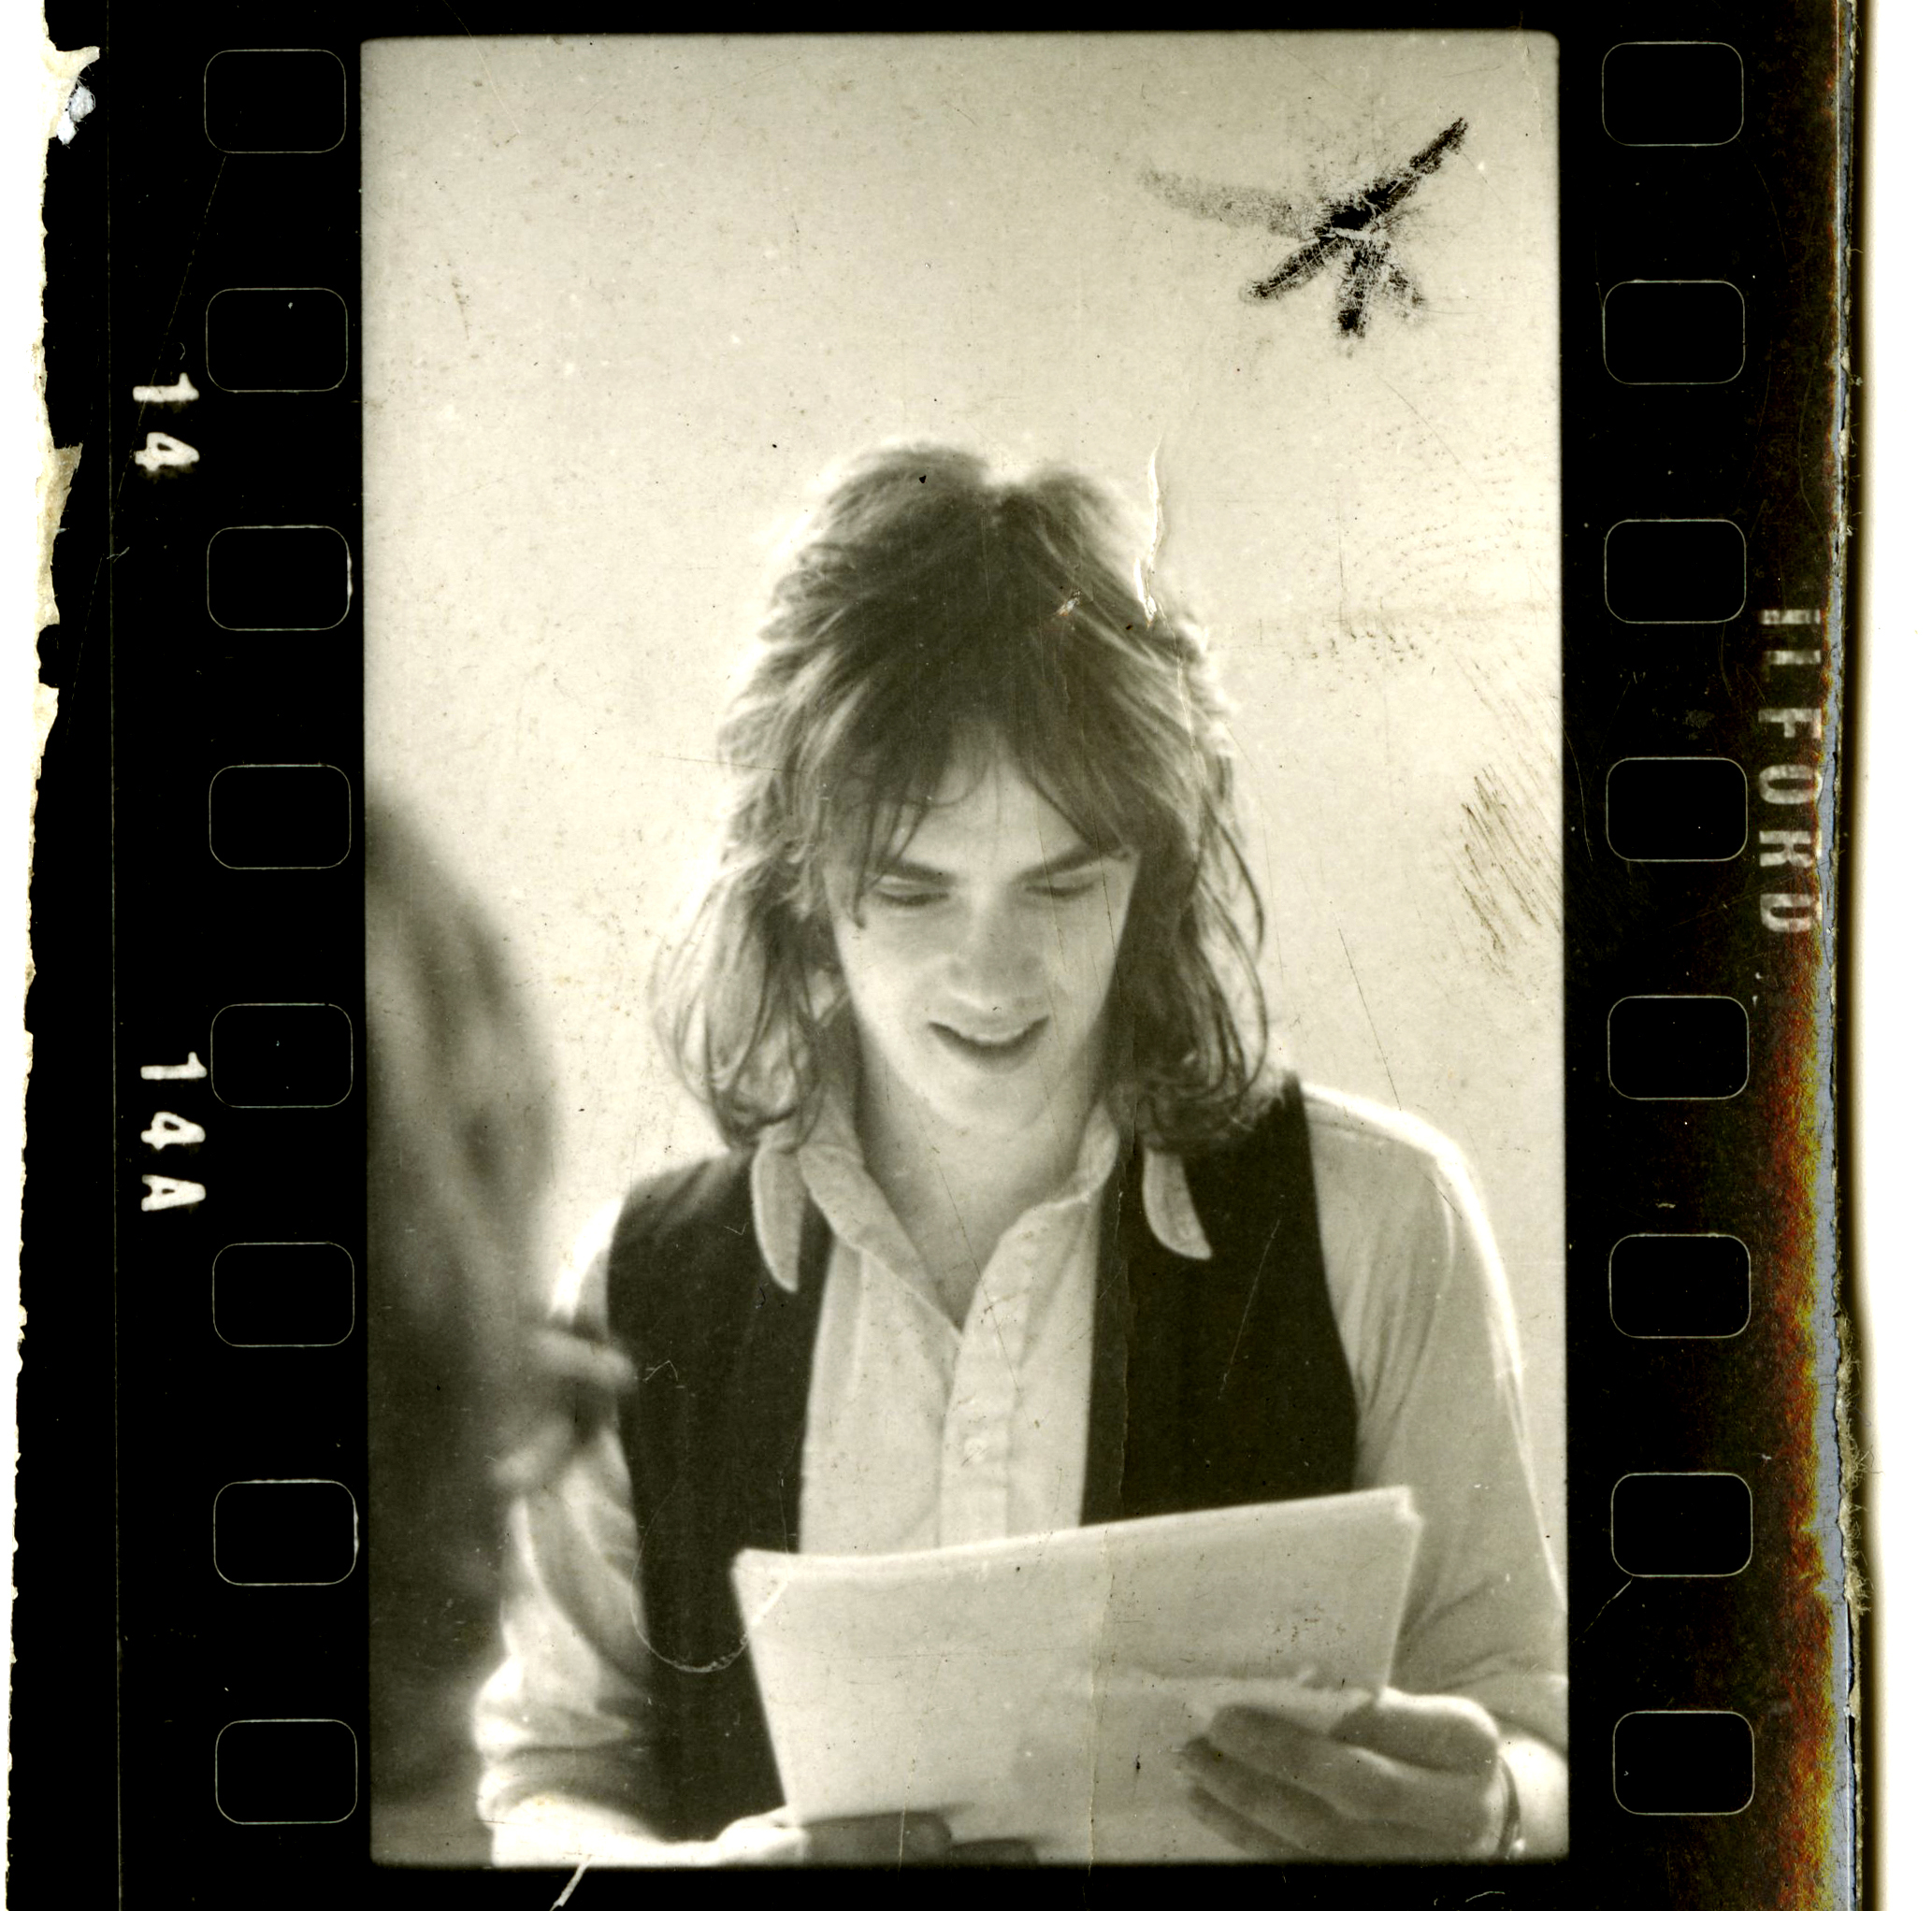 Tony Elliott, 1970. Picture by Jeremy Beadle